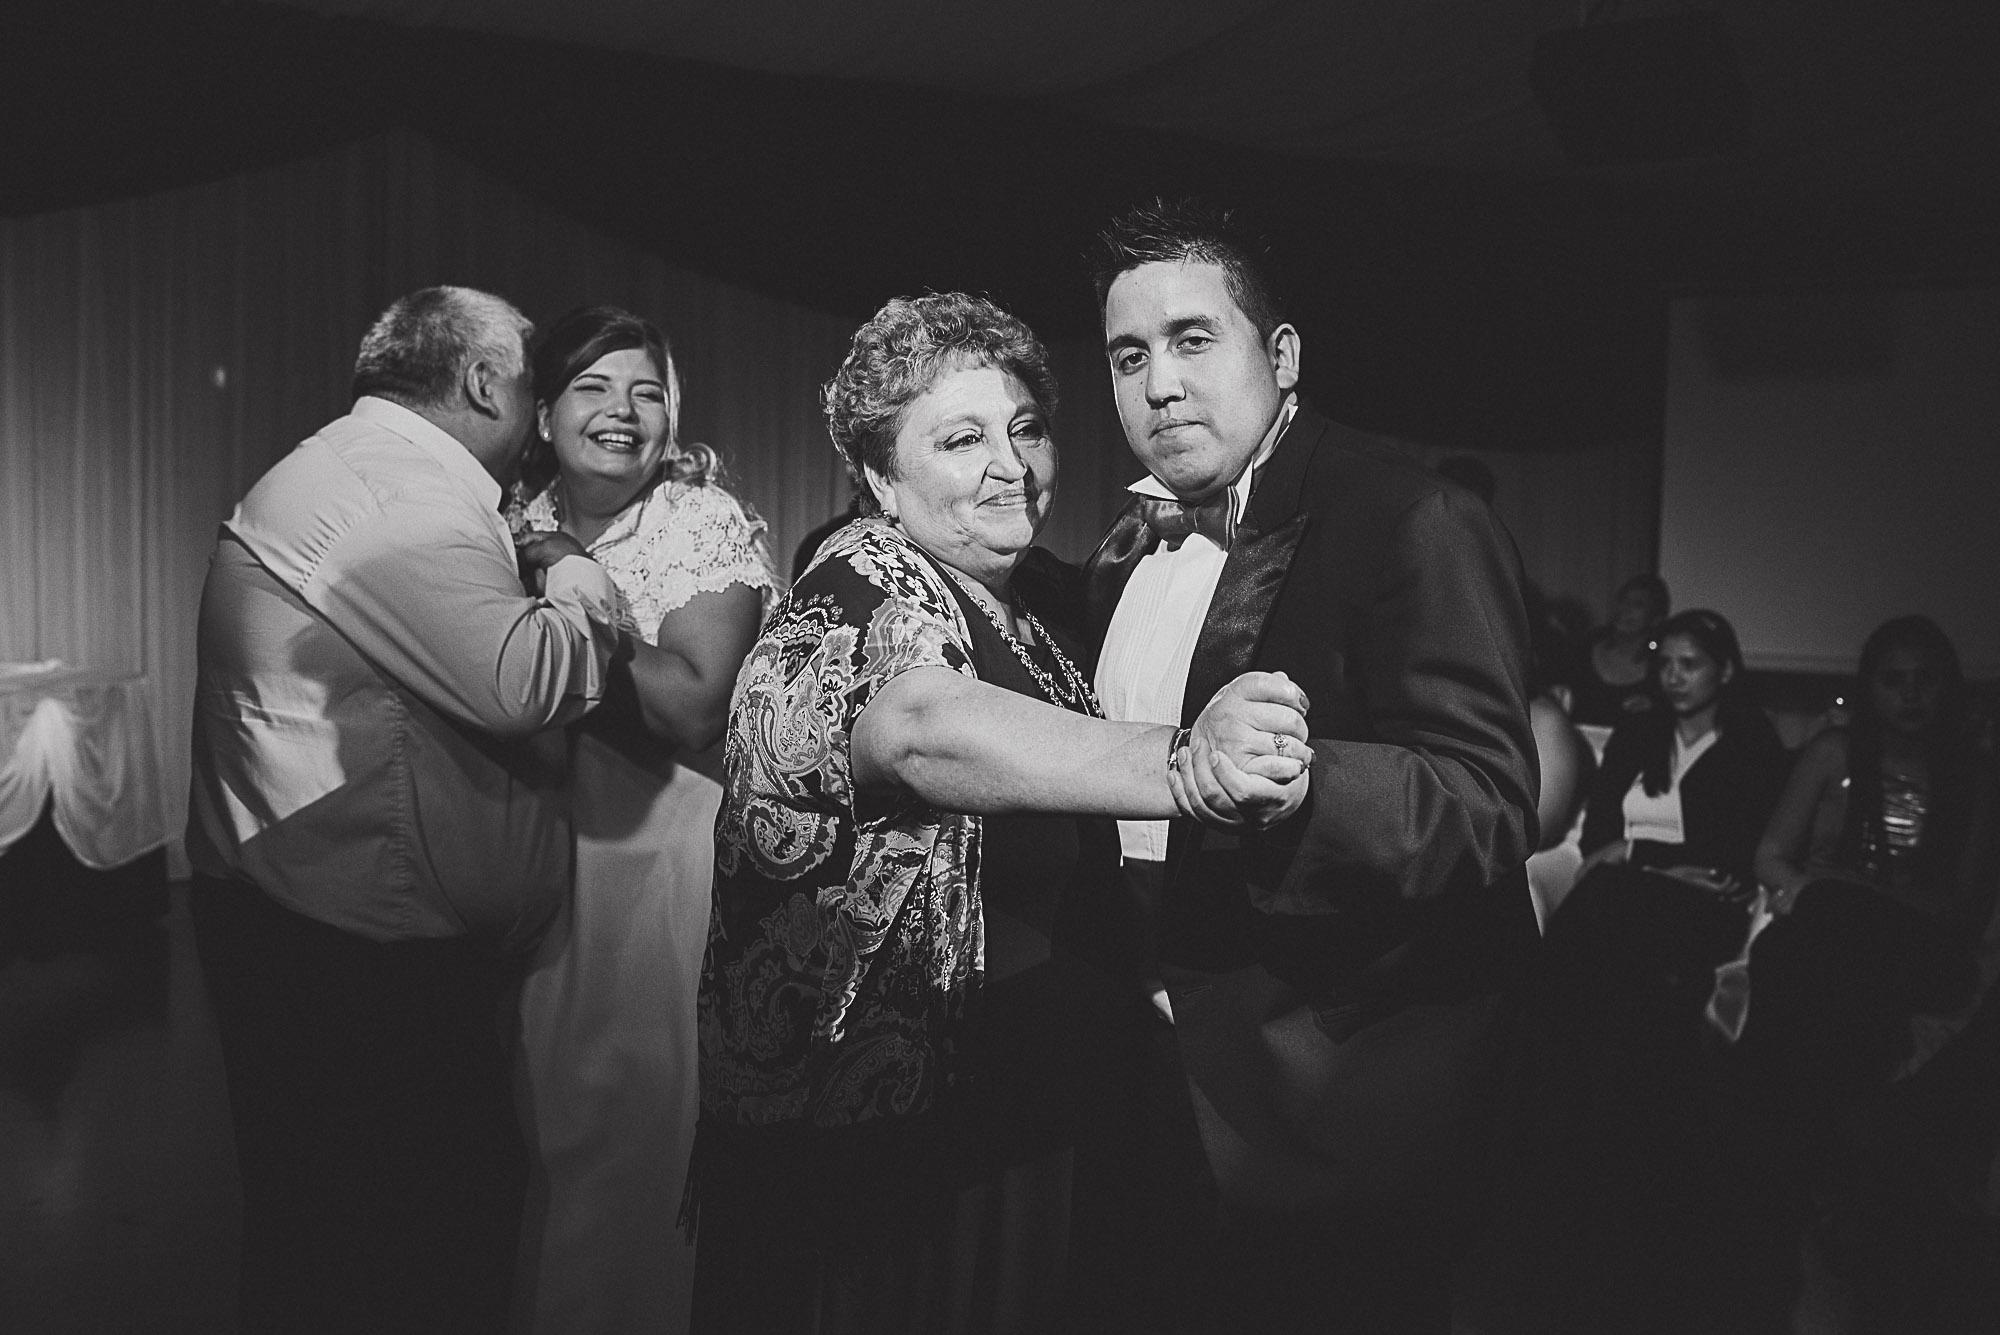 boda-vero-raul-patagonia-argentina-chilena-fotografo-de-bodas-argentina-casamiento-en-patagonia-gabriel-roa-photography-25